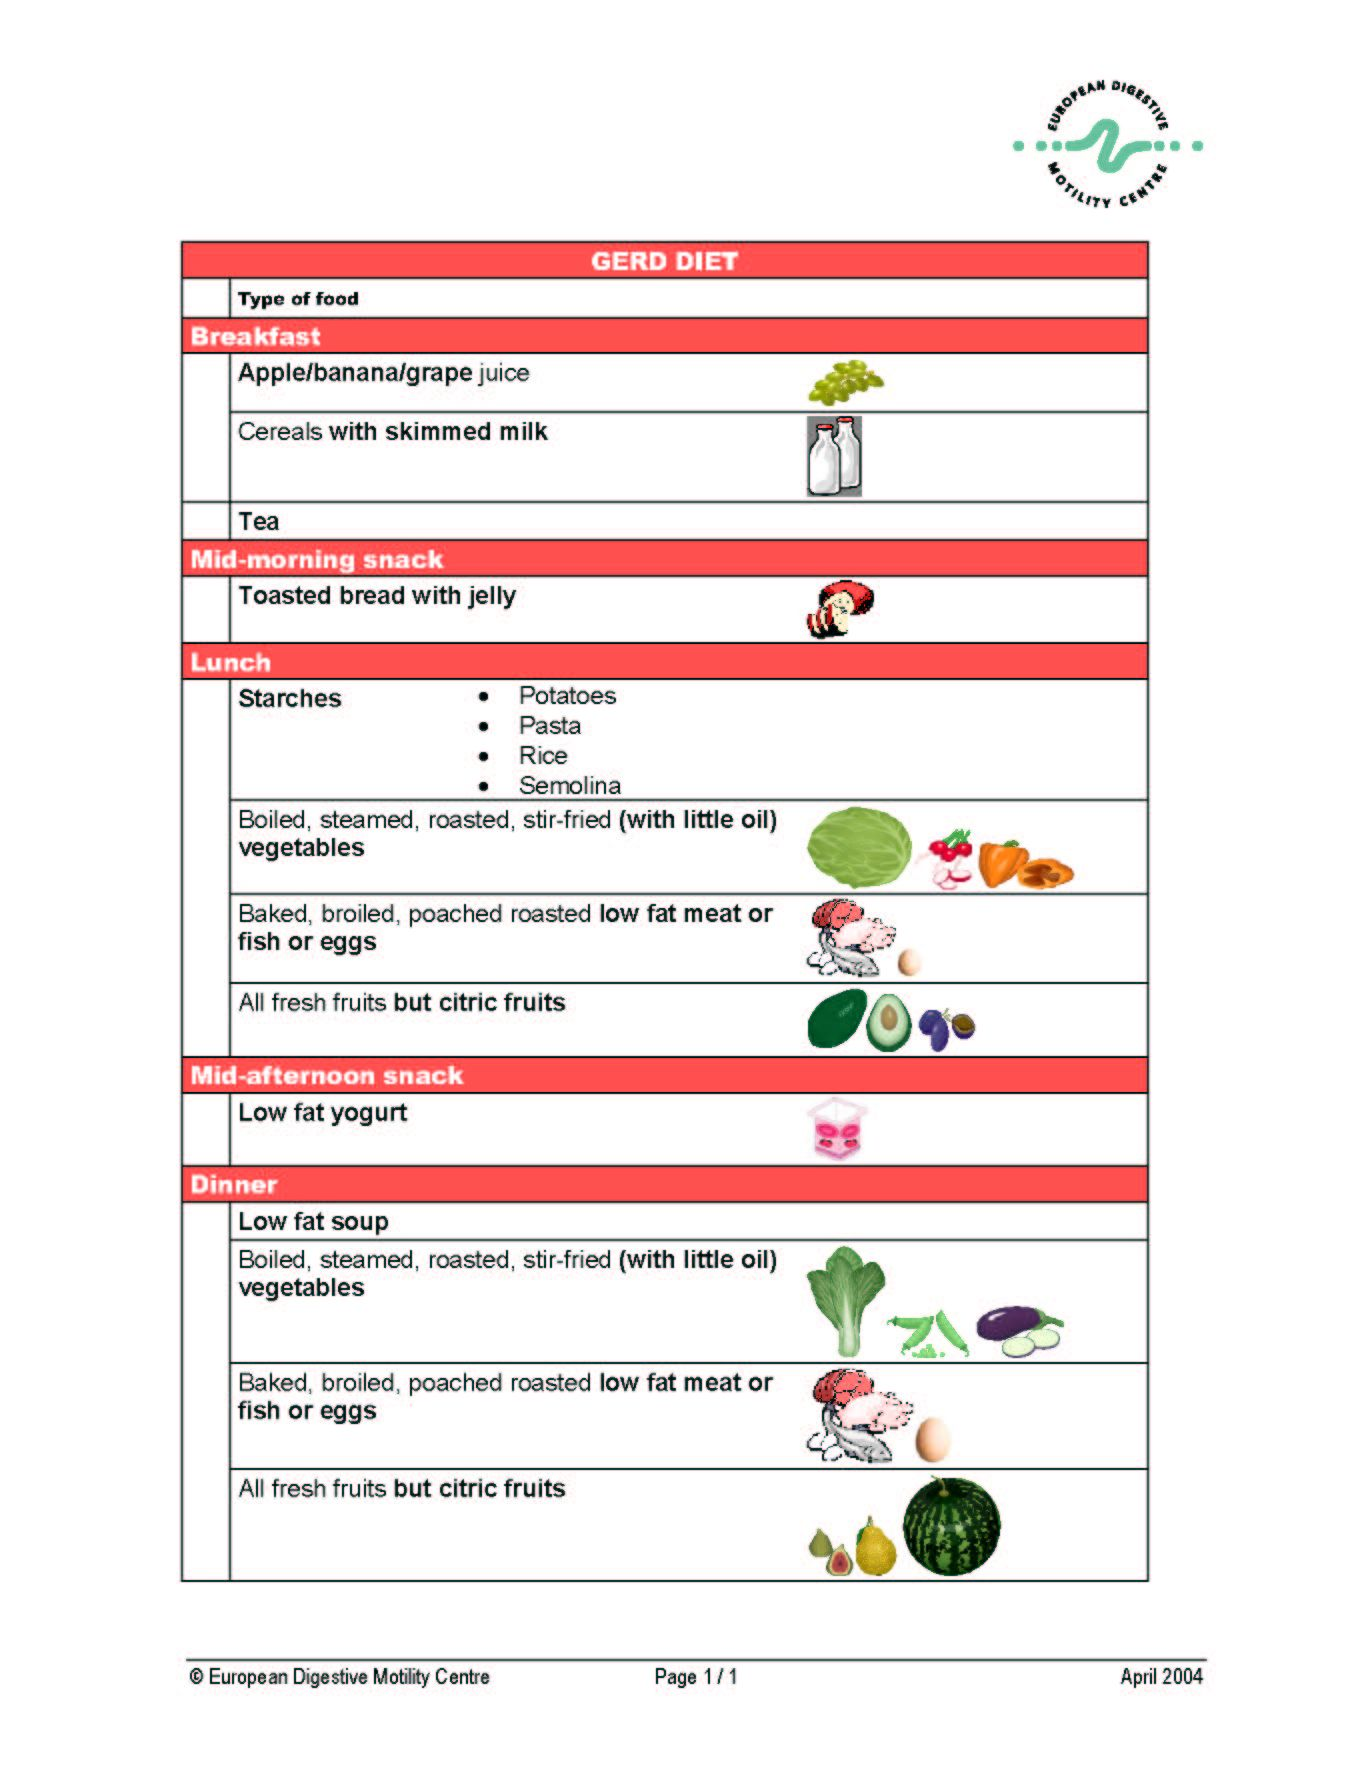 Gerd Diet Home Remedies For Heartburn Gerd Diet Baked Vegetables